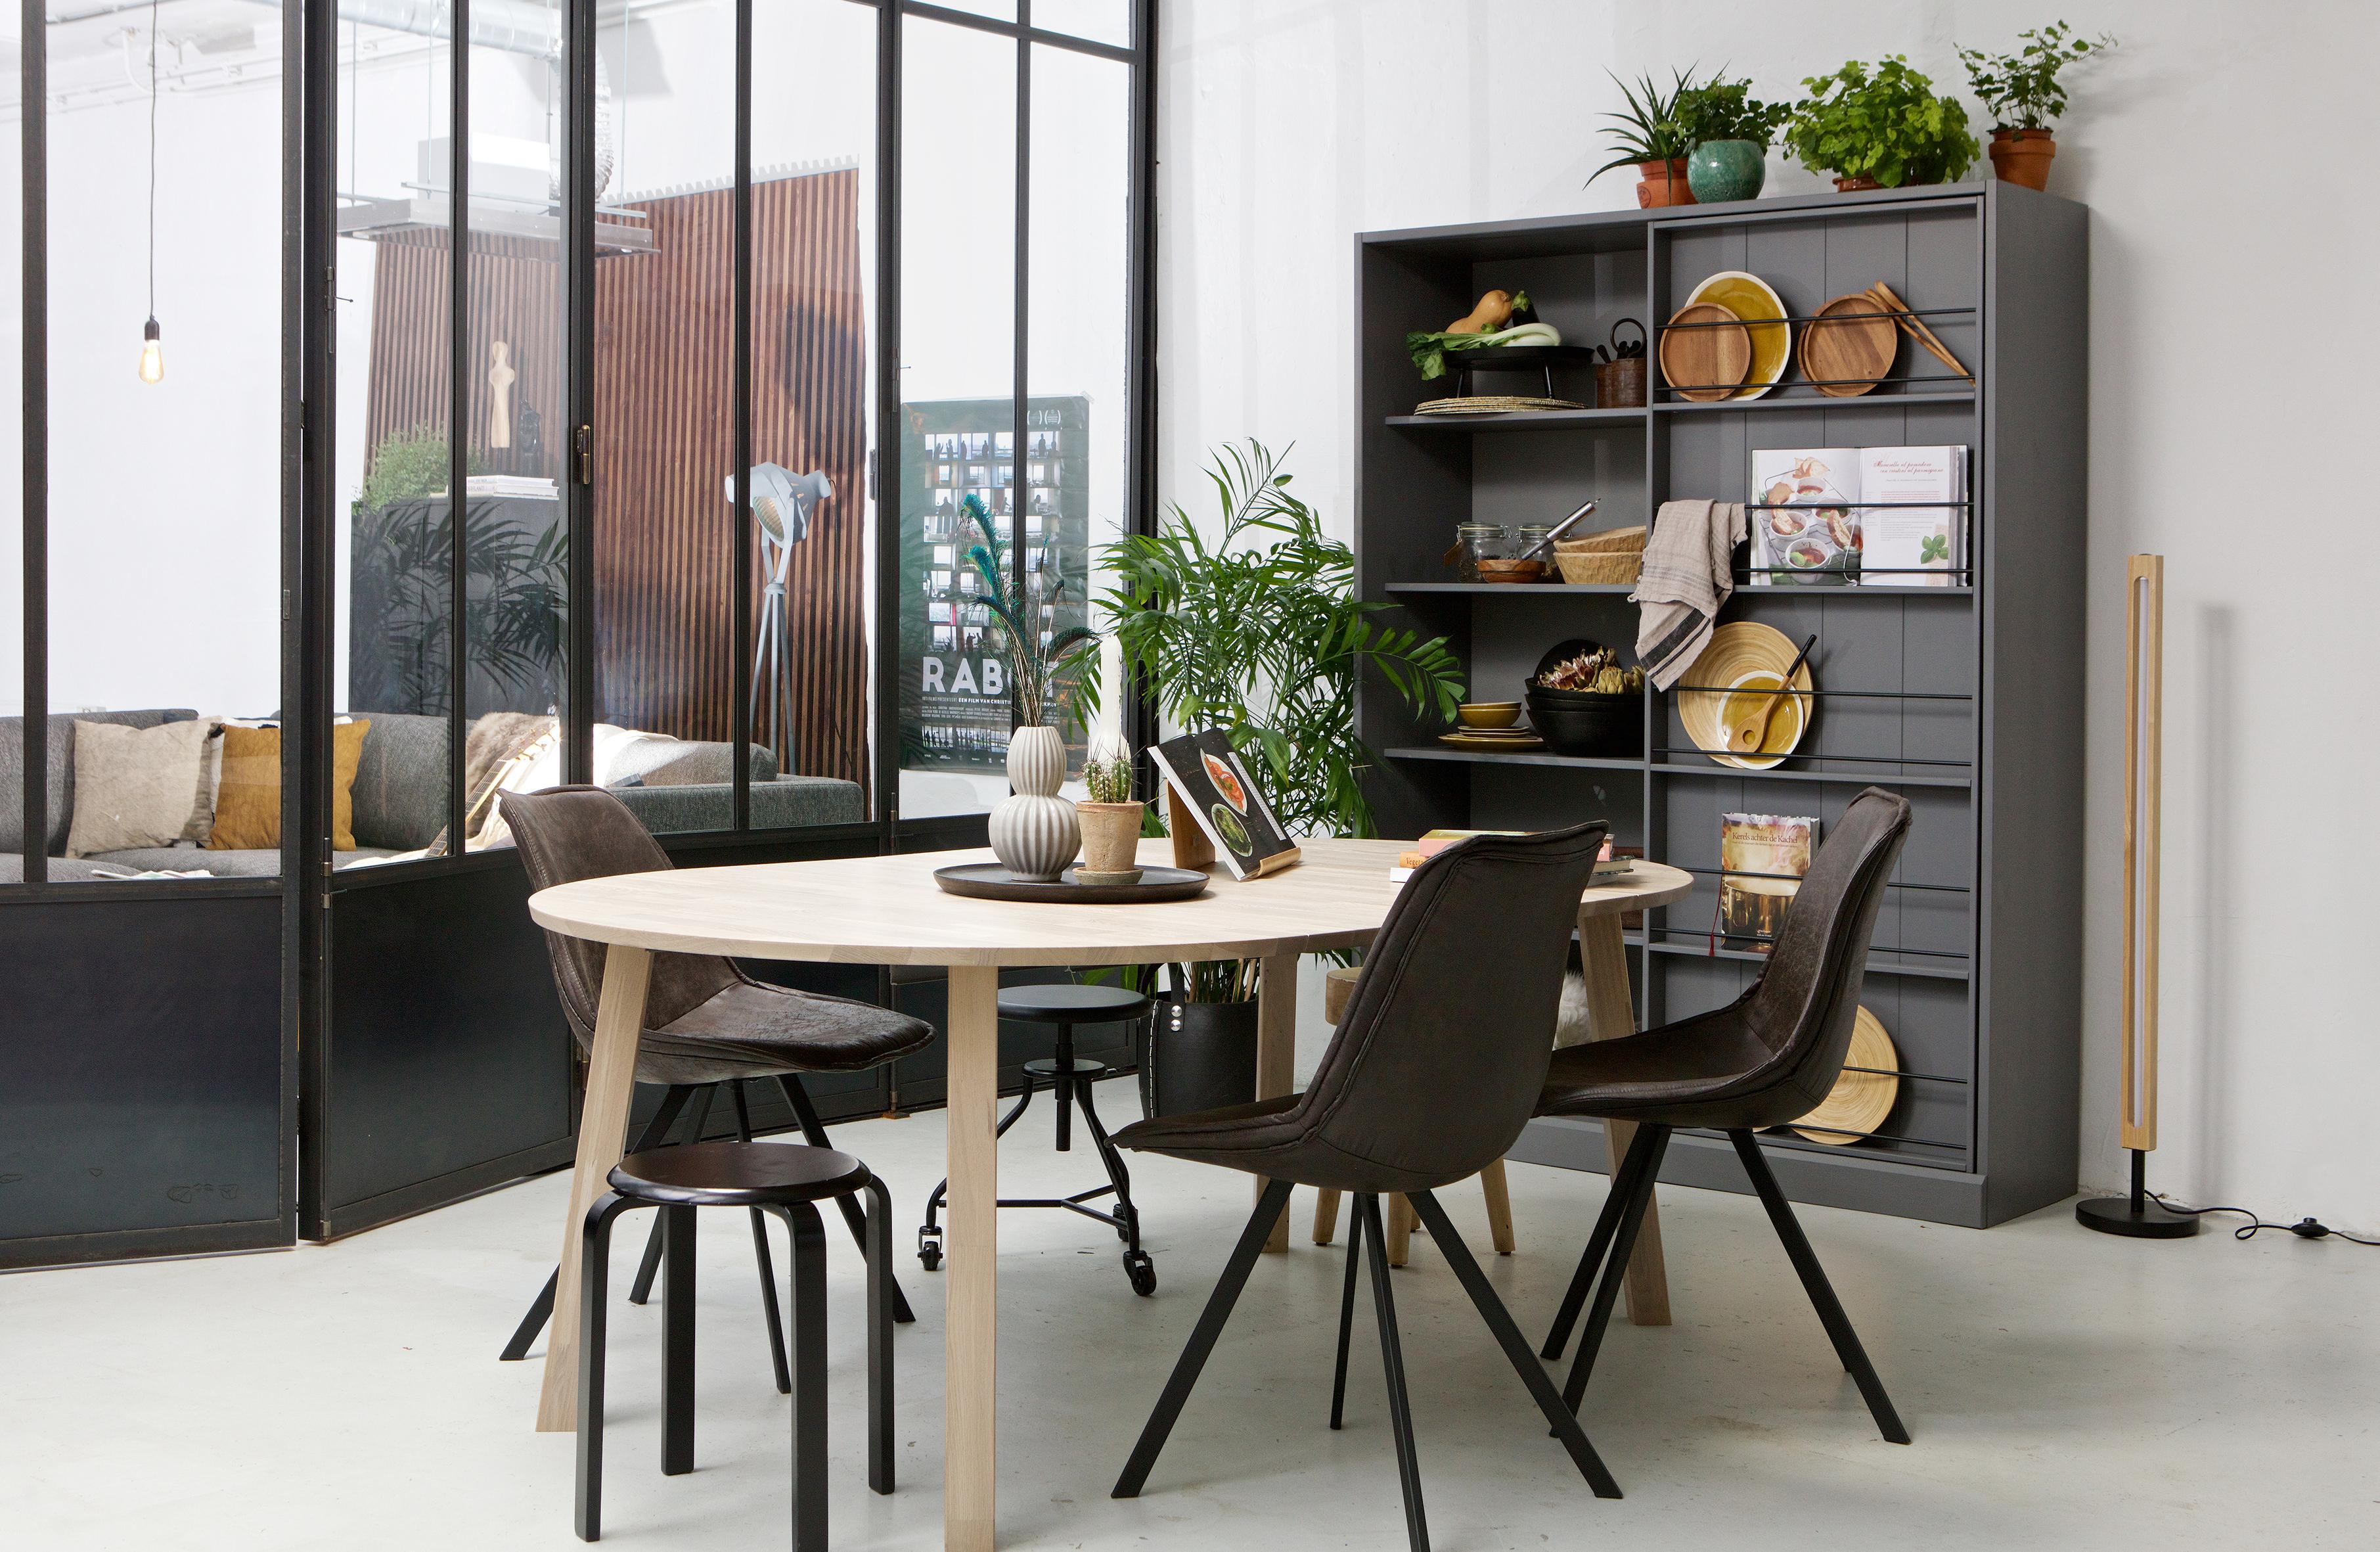 Woood Tafel Rond : Lange jan uitschuifbare eettafel rond eiken sydney fsc tafels